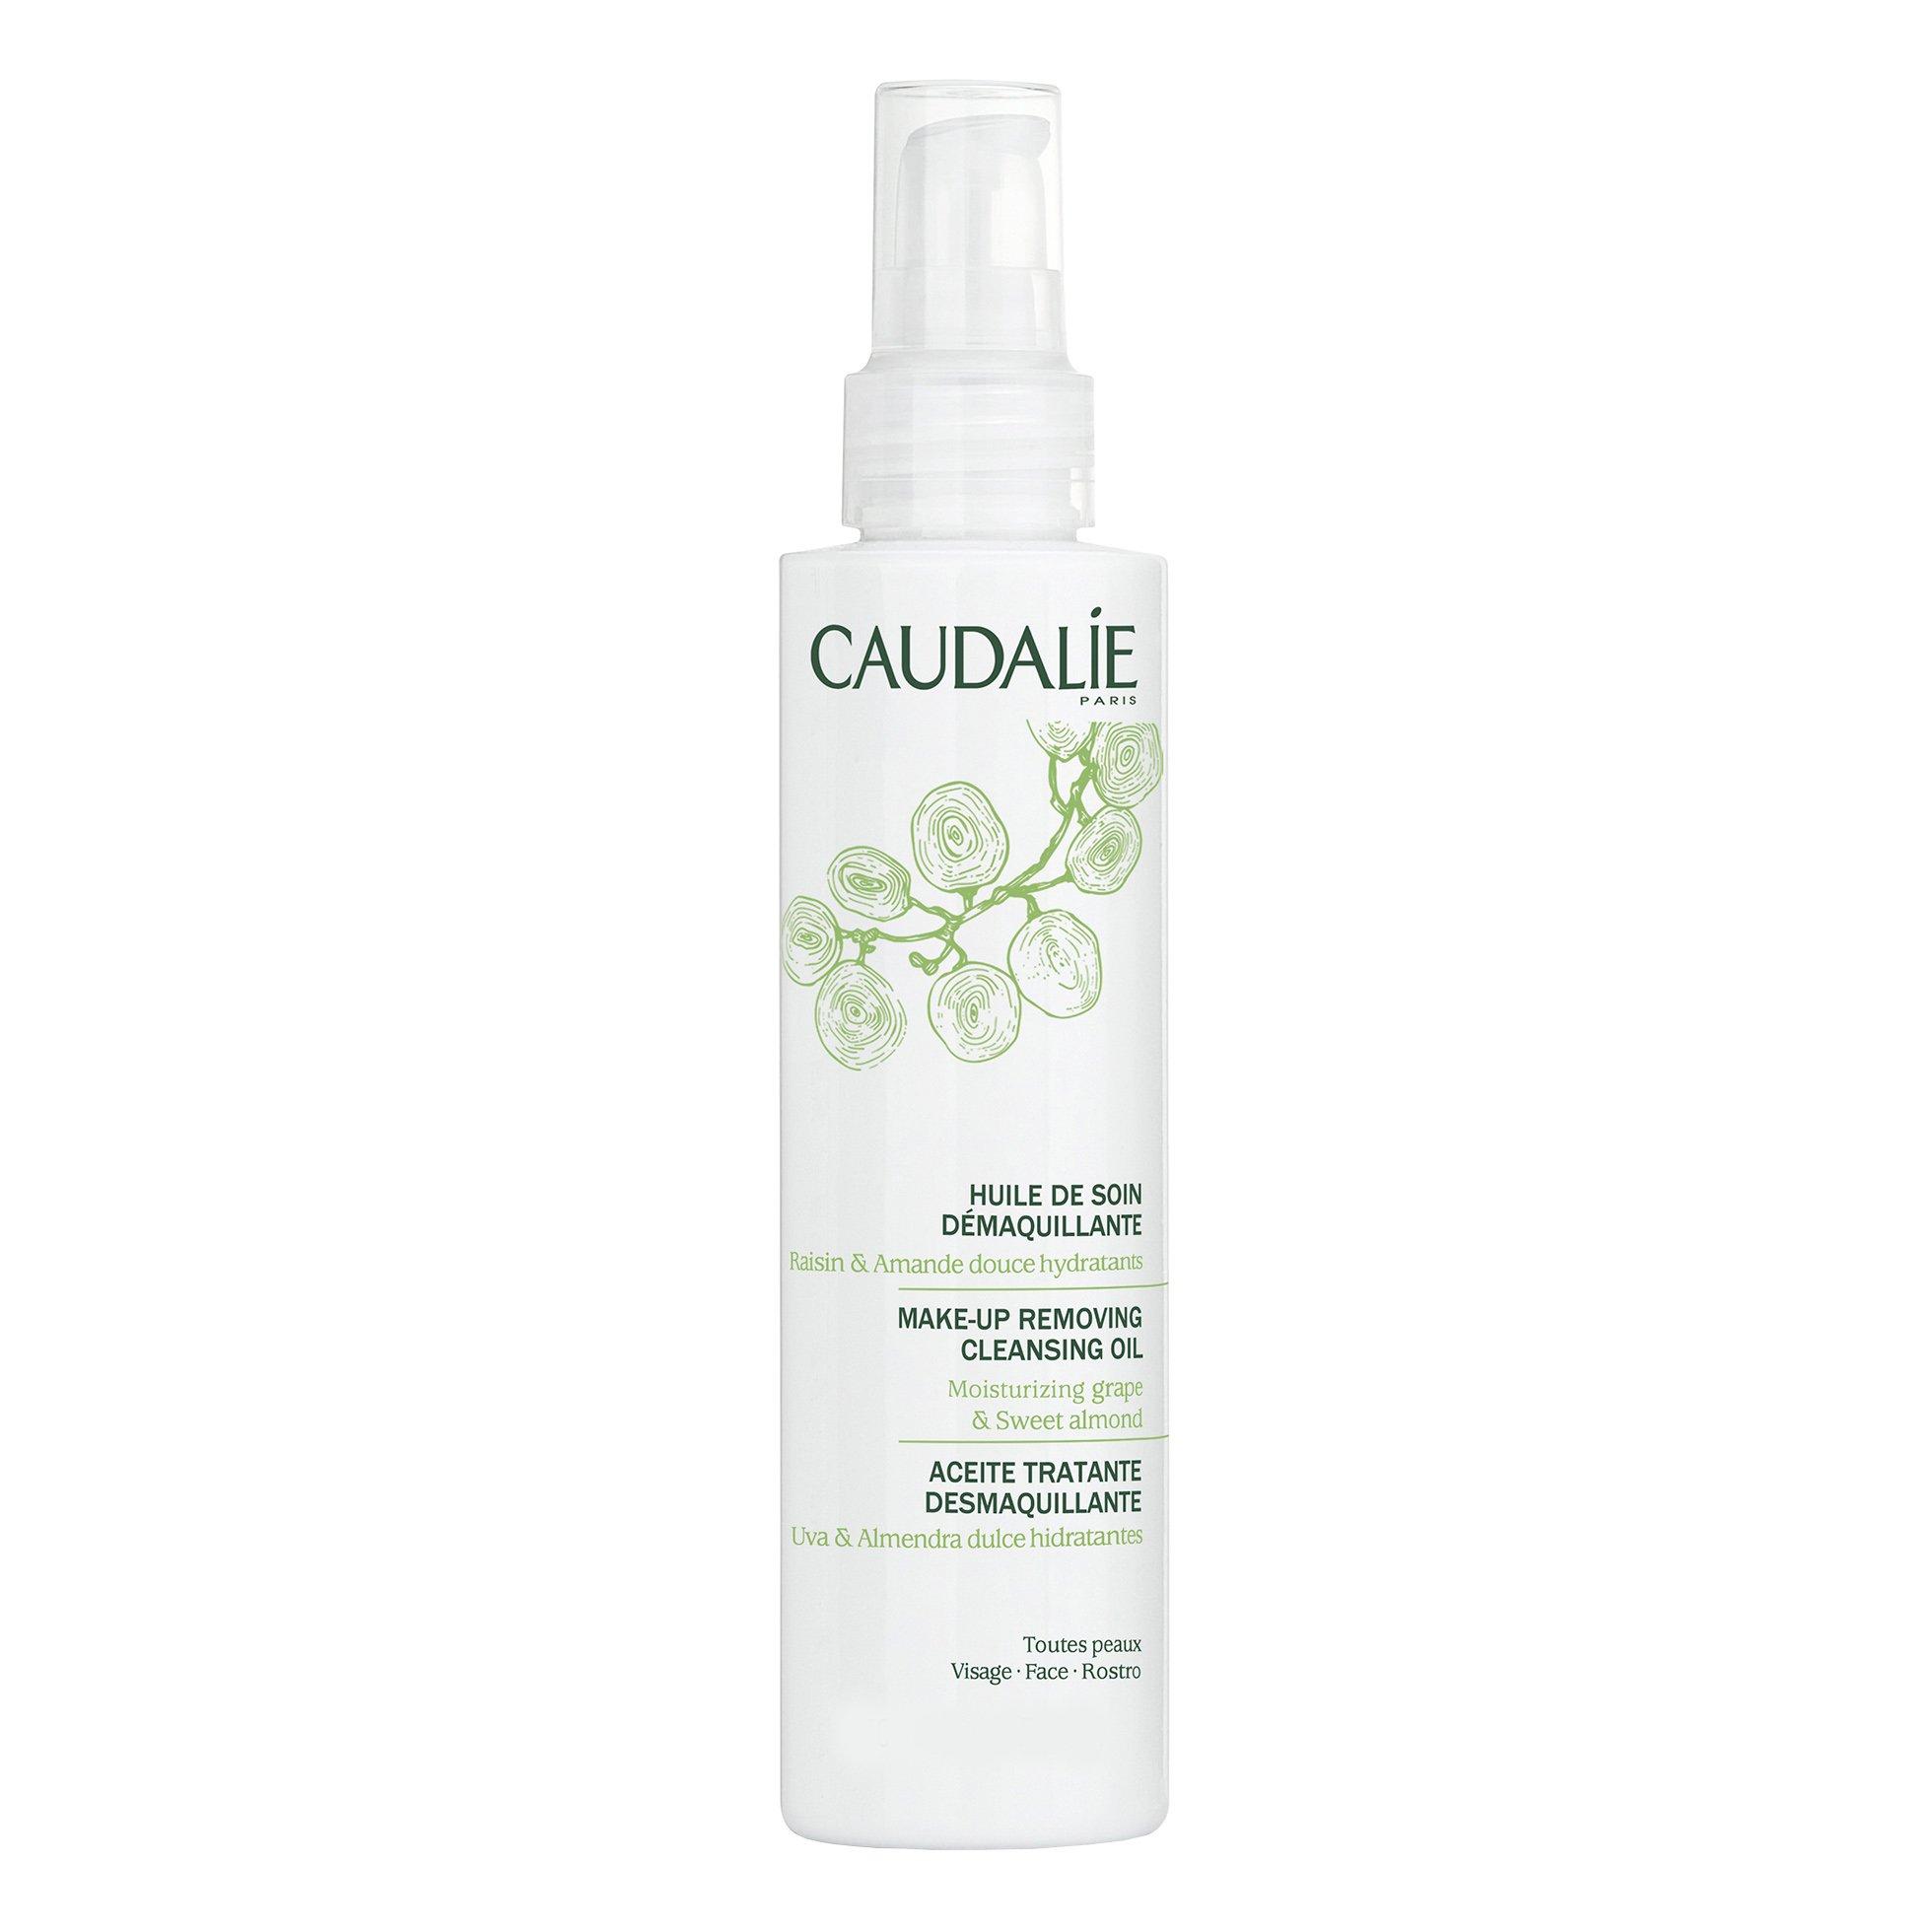 Caudalie Make-Up Removing Cleansing Oil Έλαιο Καθαρισμού & Ντεμακιγιάζ για Όλους τους Τύπους Επιδερμίδας 75ml